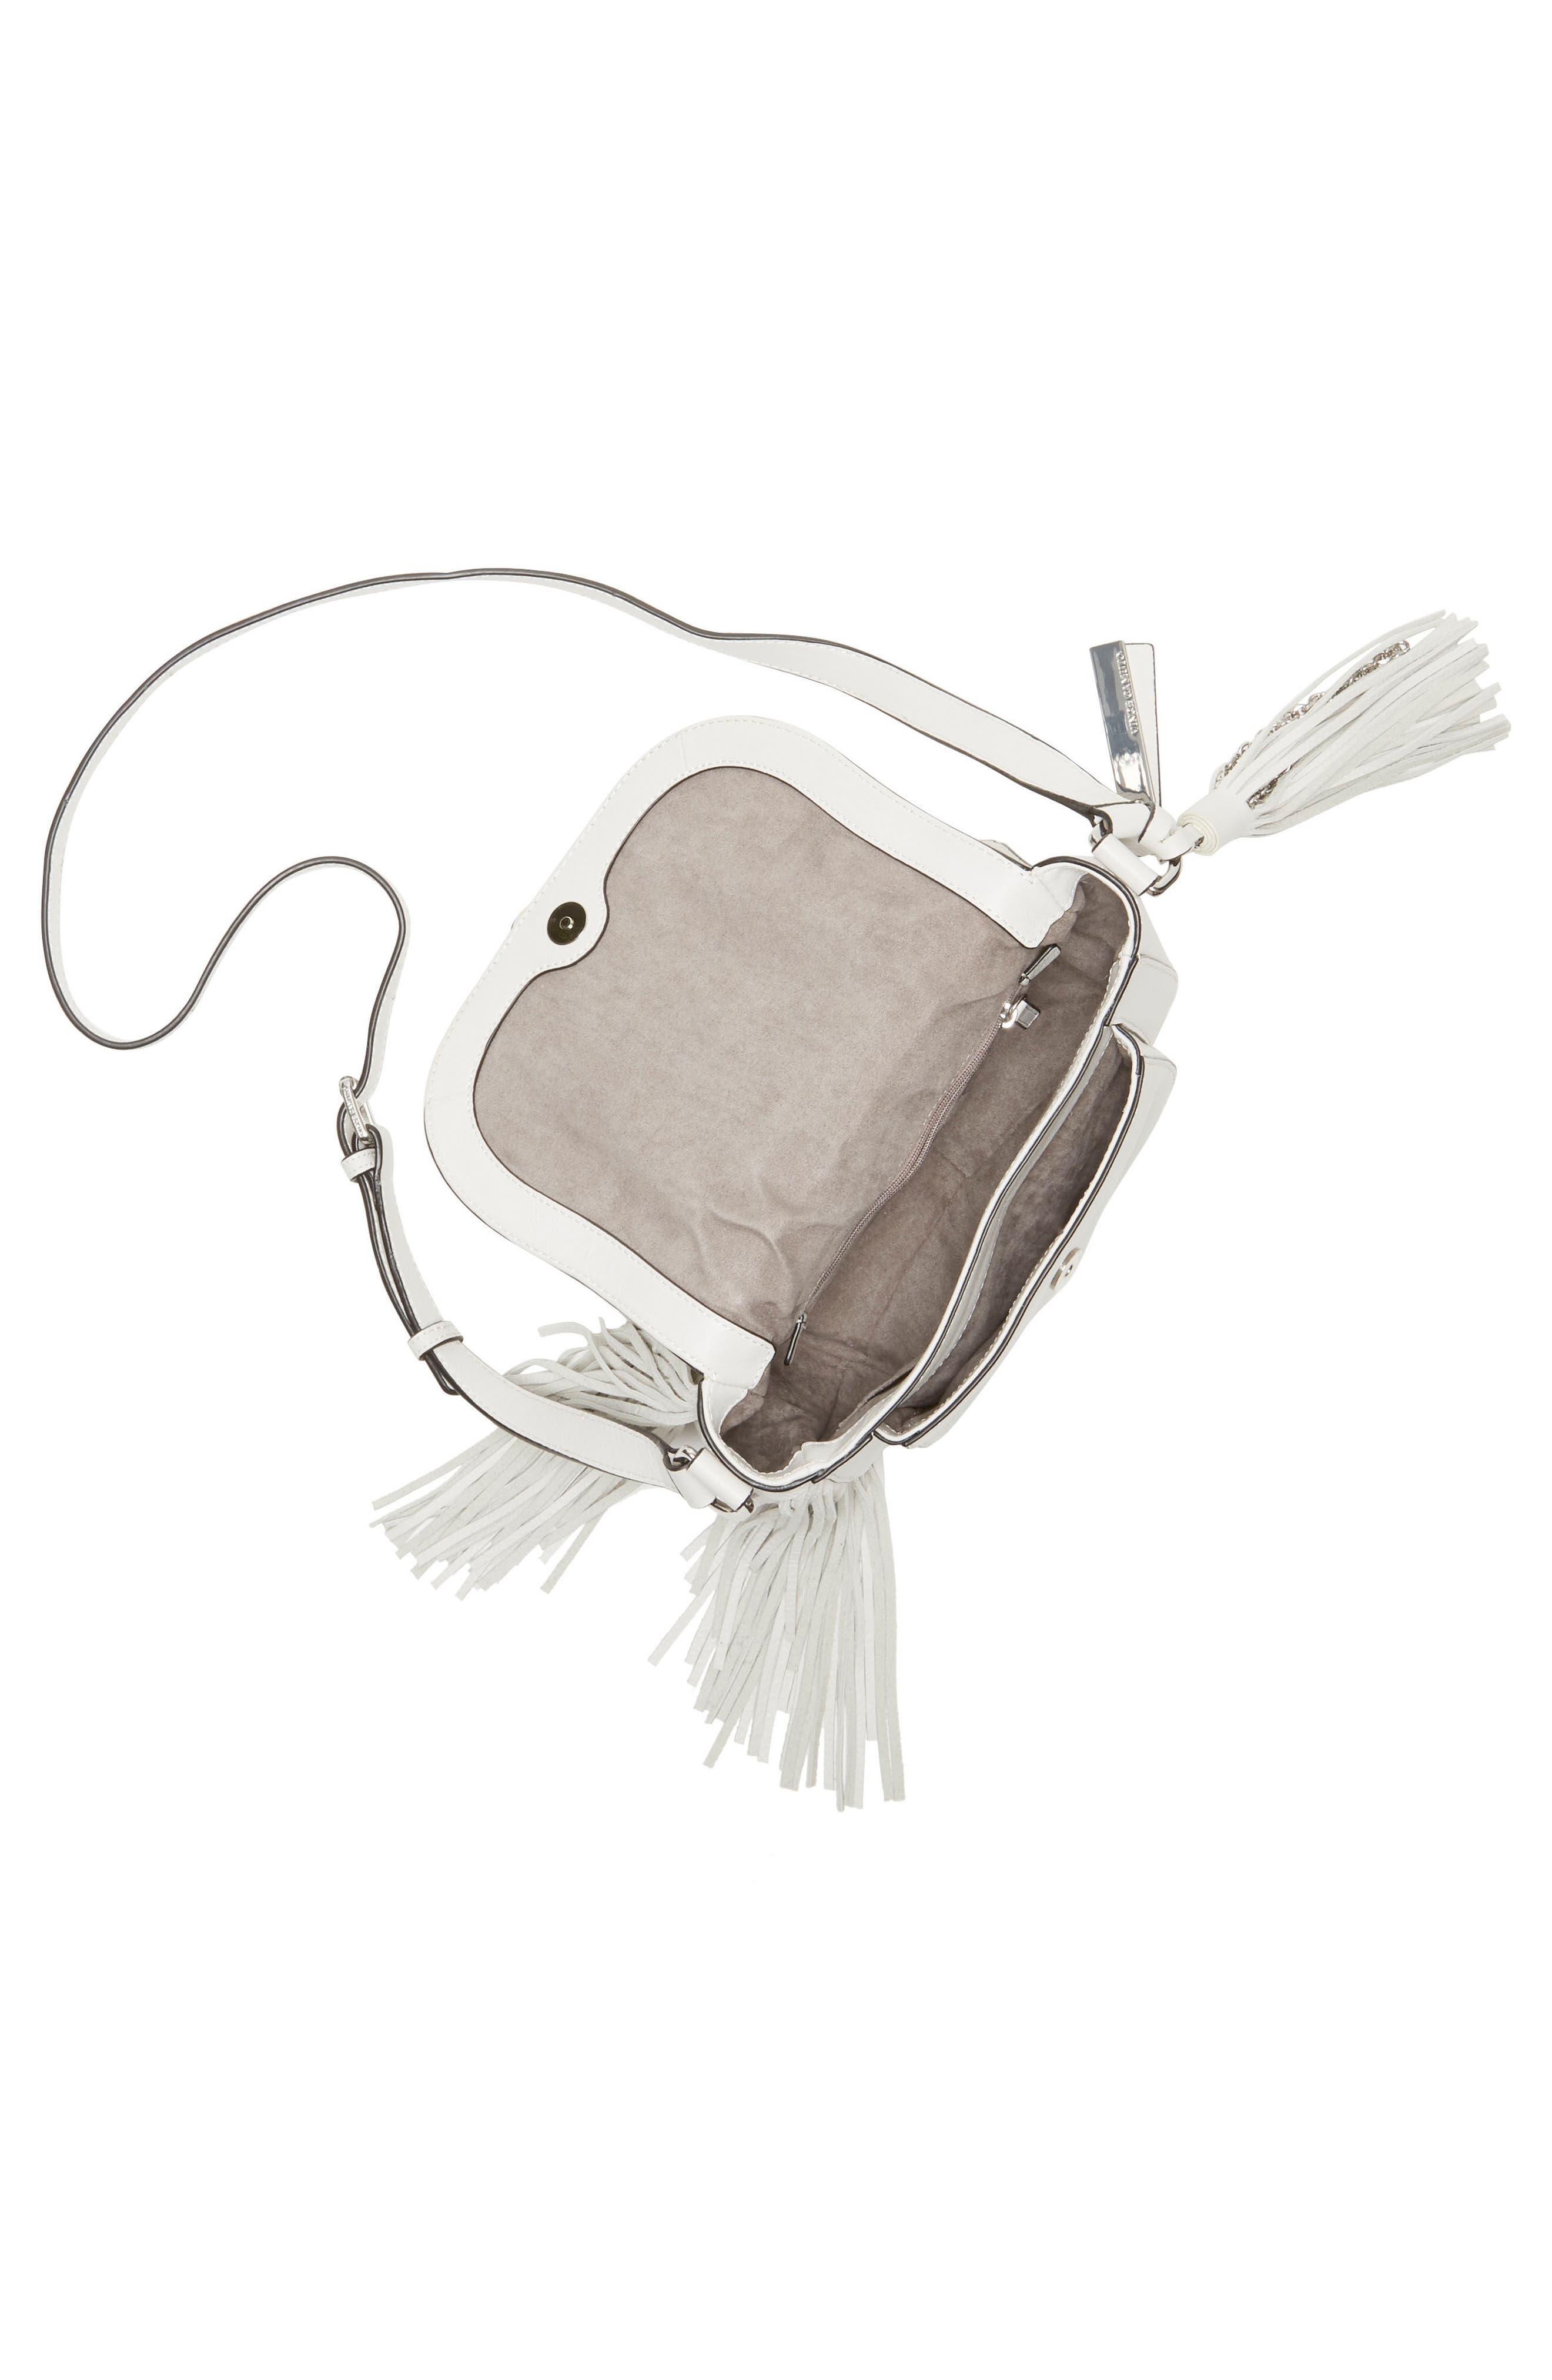 Hil Leather Crossbody Bag,                             Alternate thumbnail 6, color,